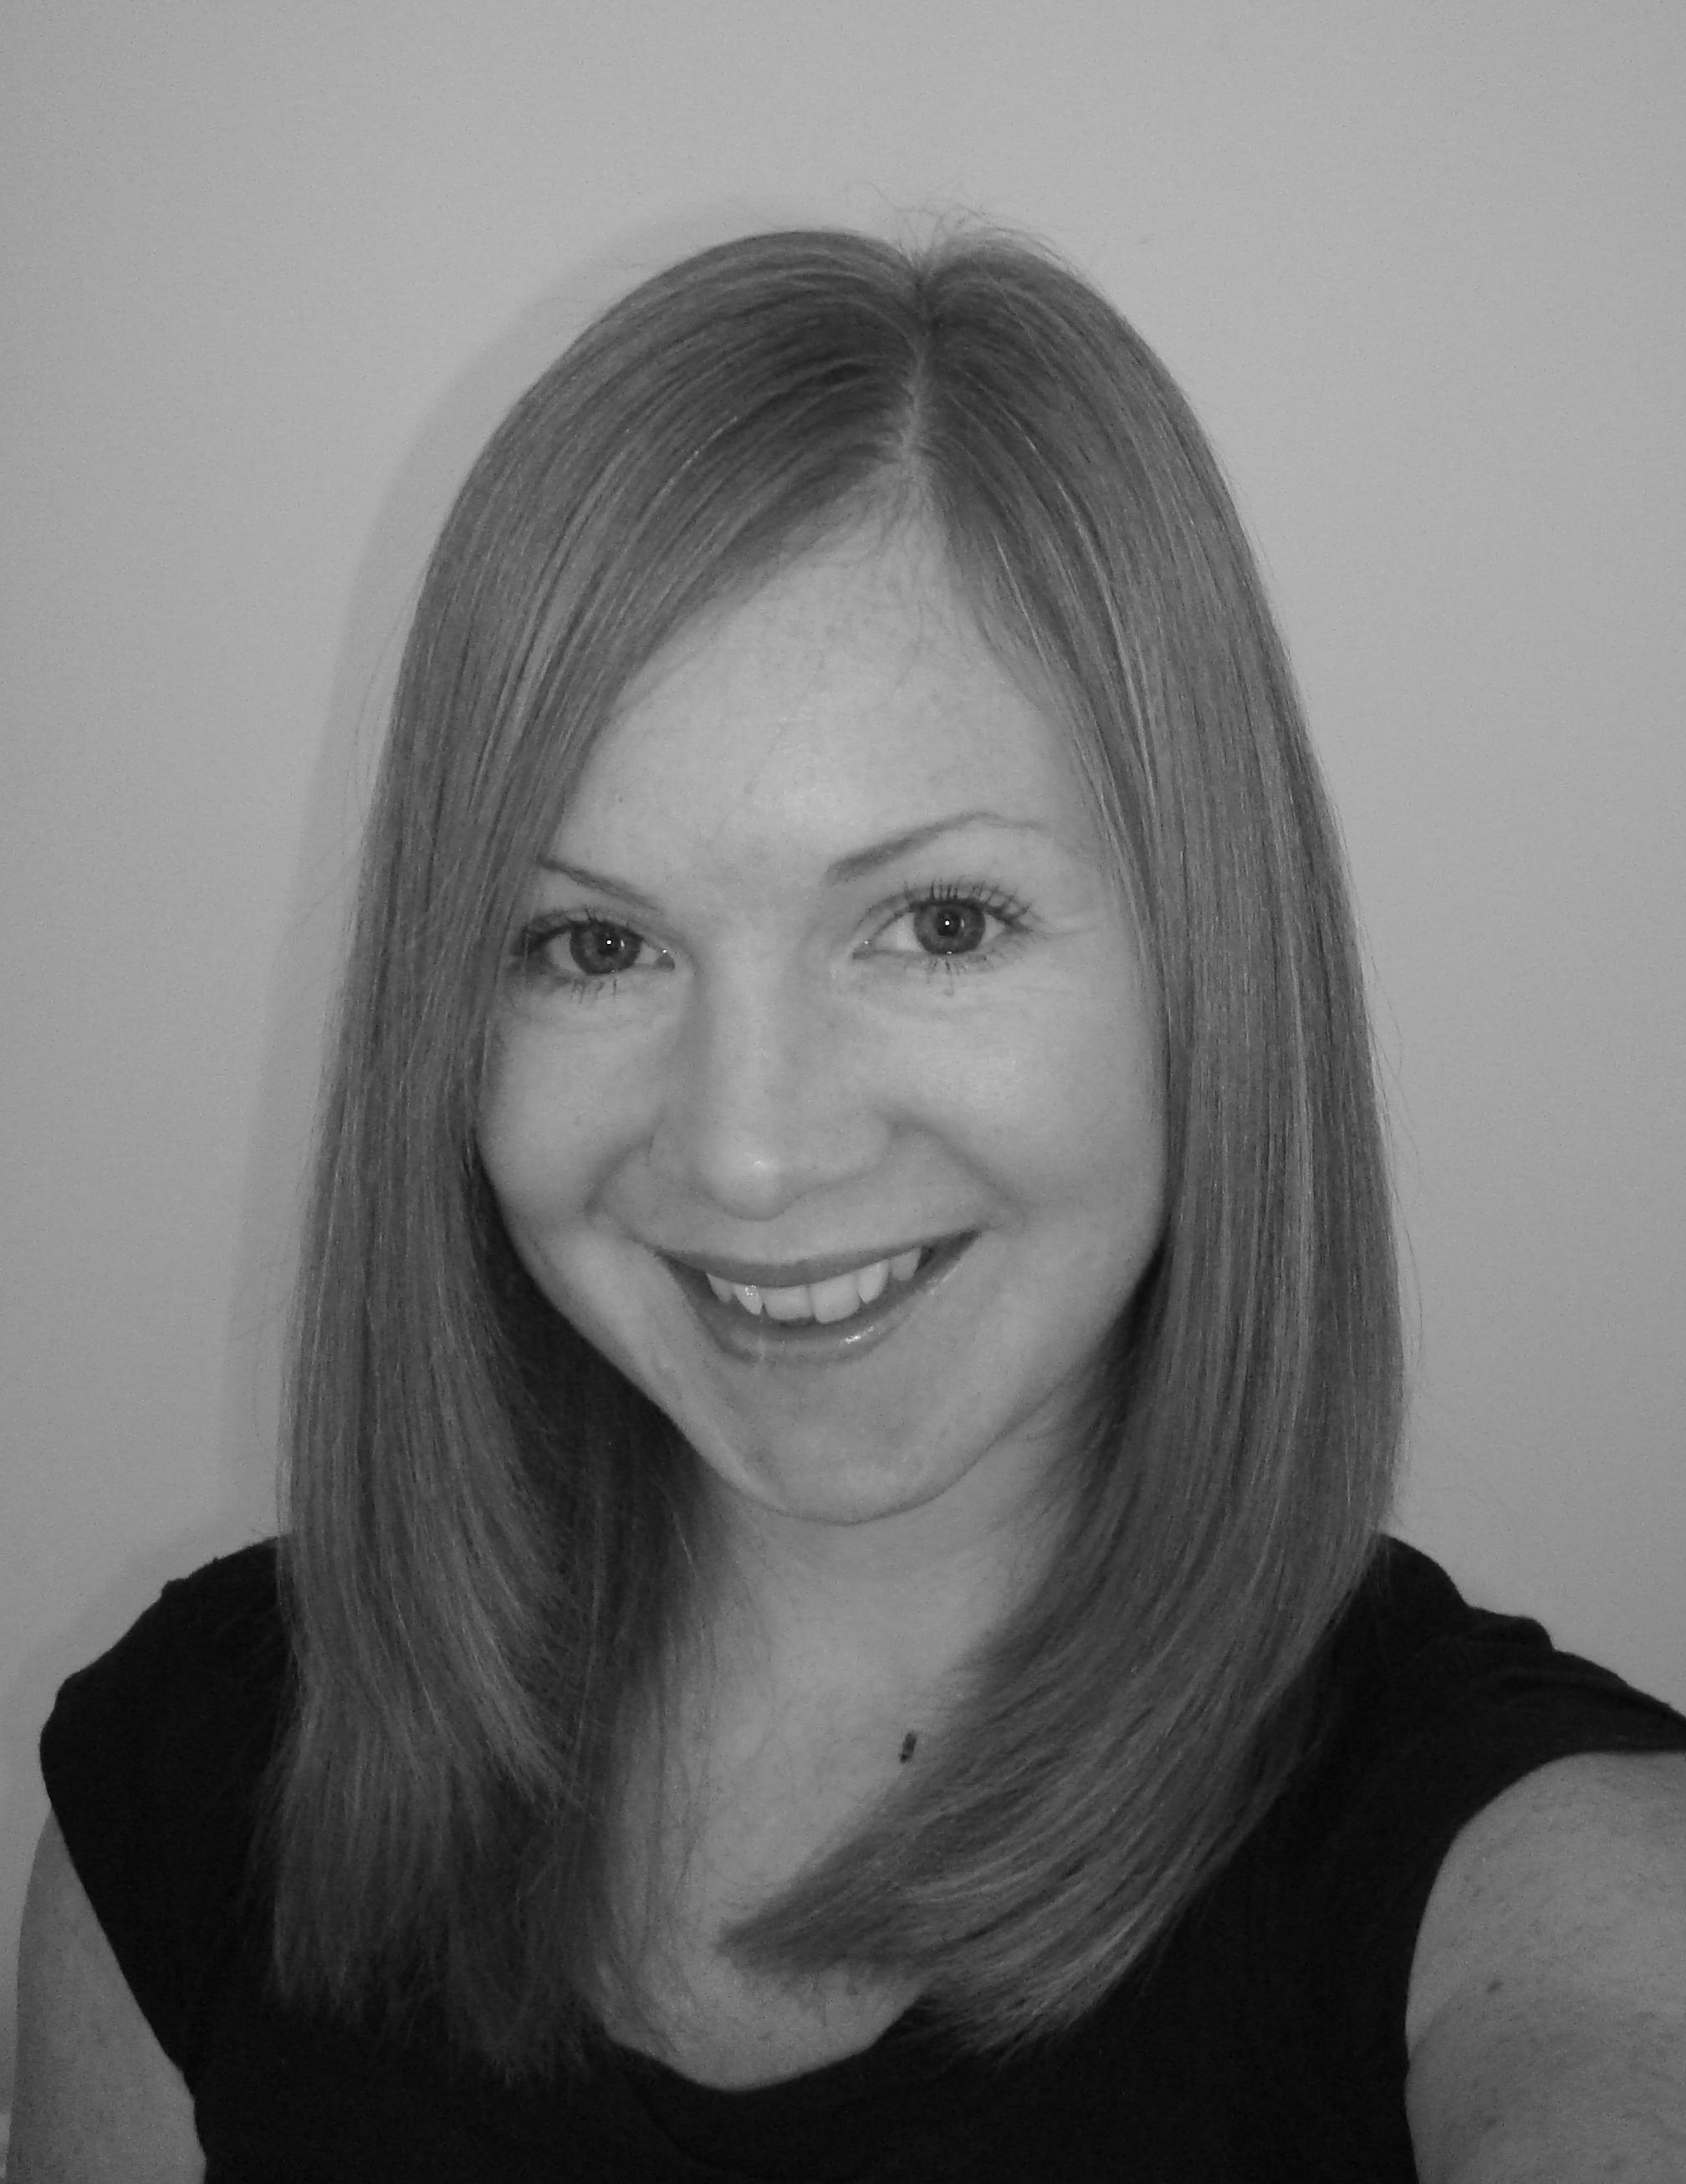 Catherine Hart - photo - catherine-hart-photo1